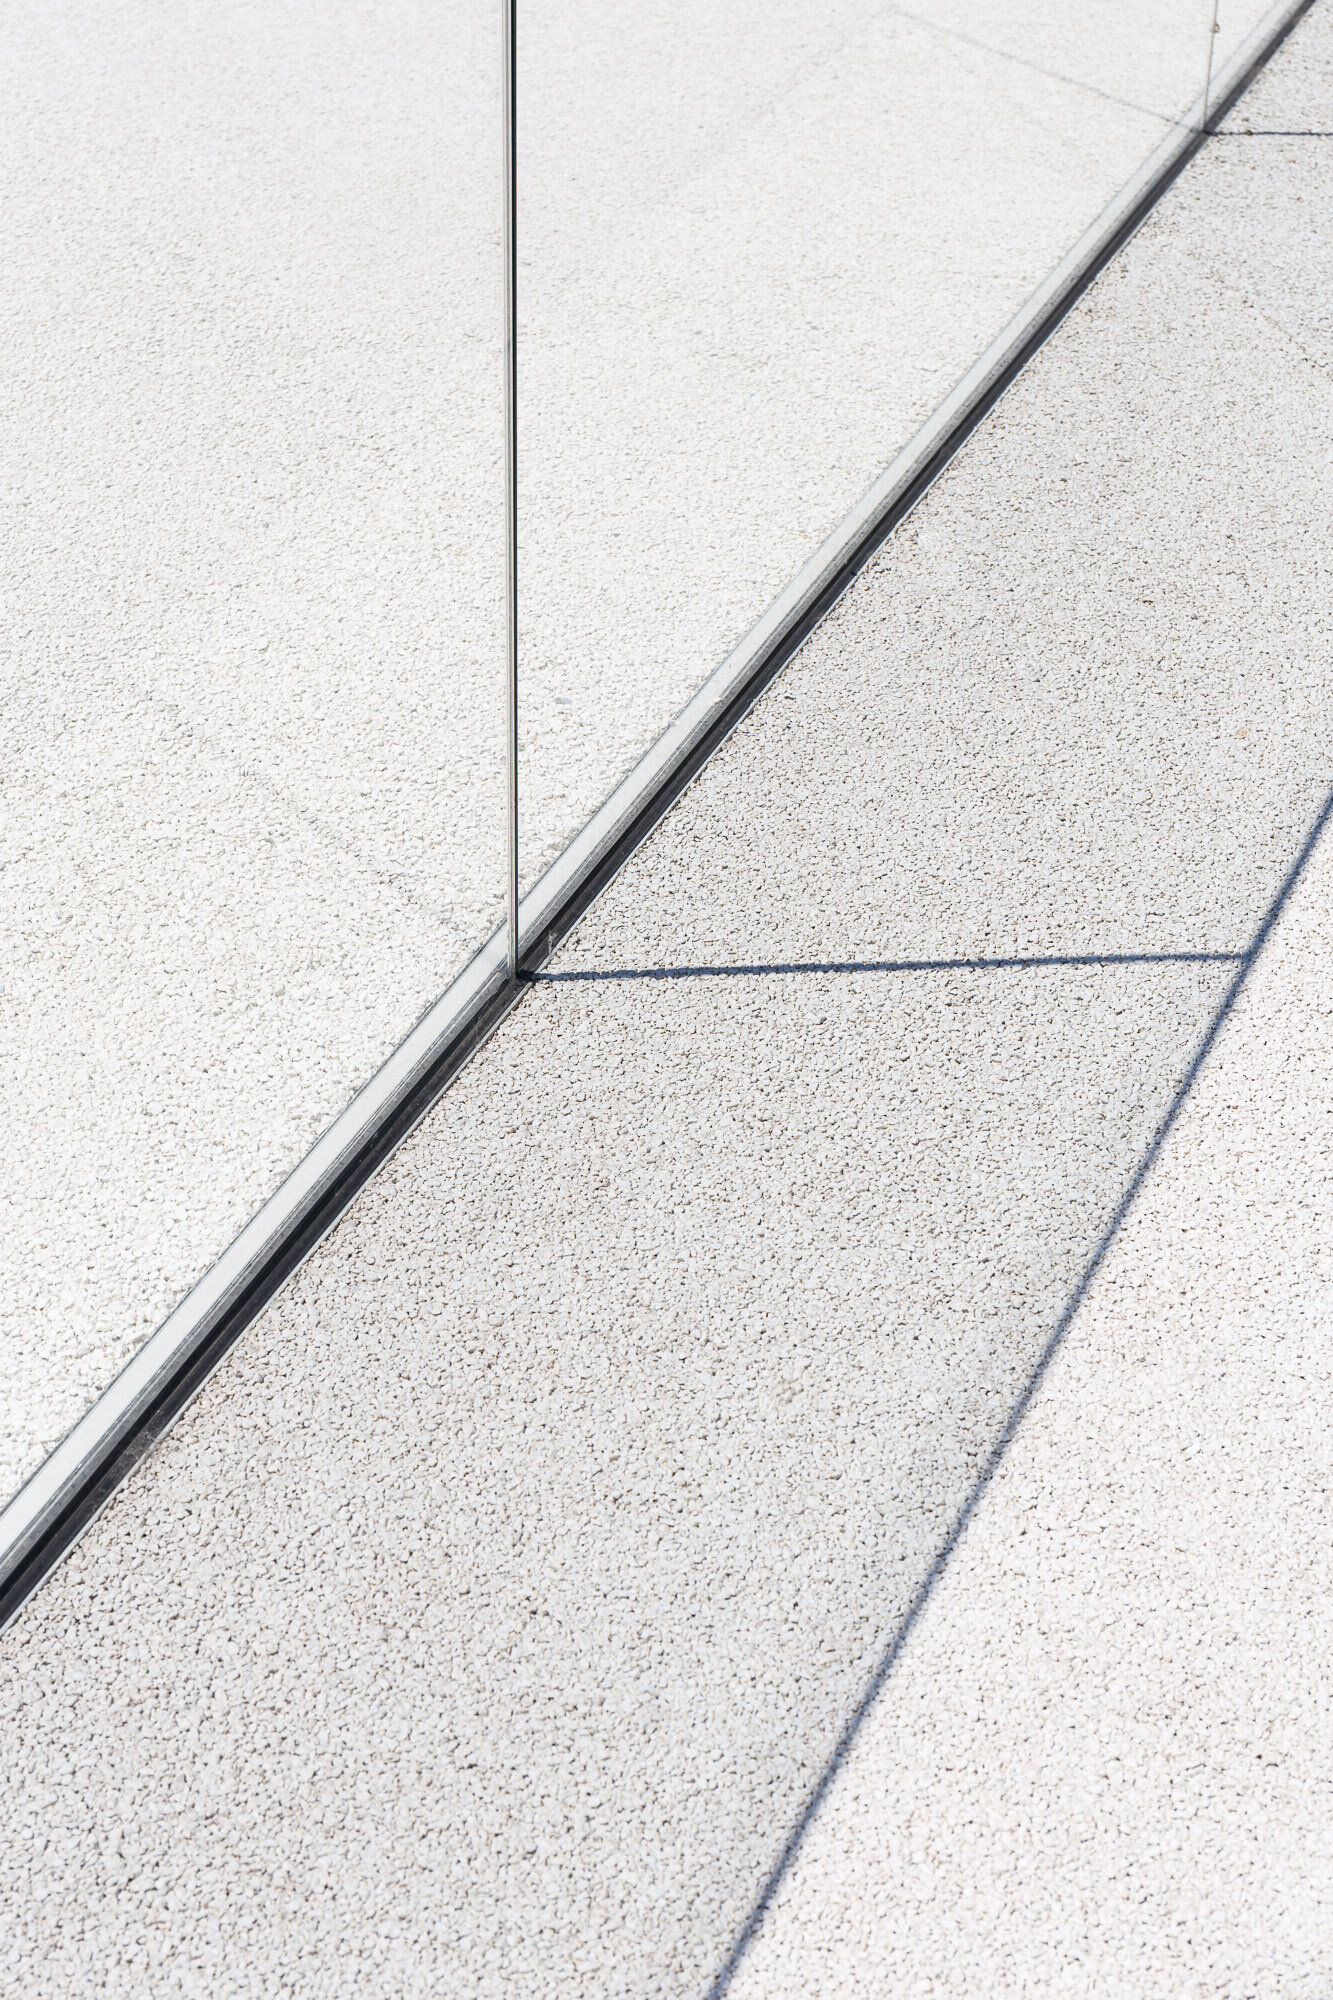 lisbon-cruise-terminal-glass-barrier-clear-space-photography.jpg